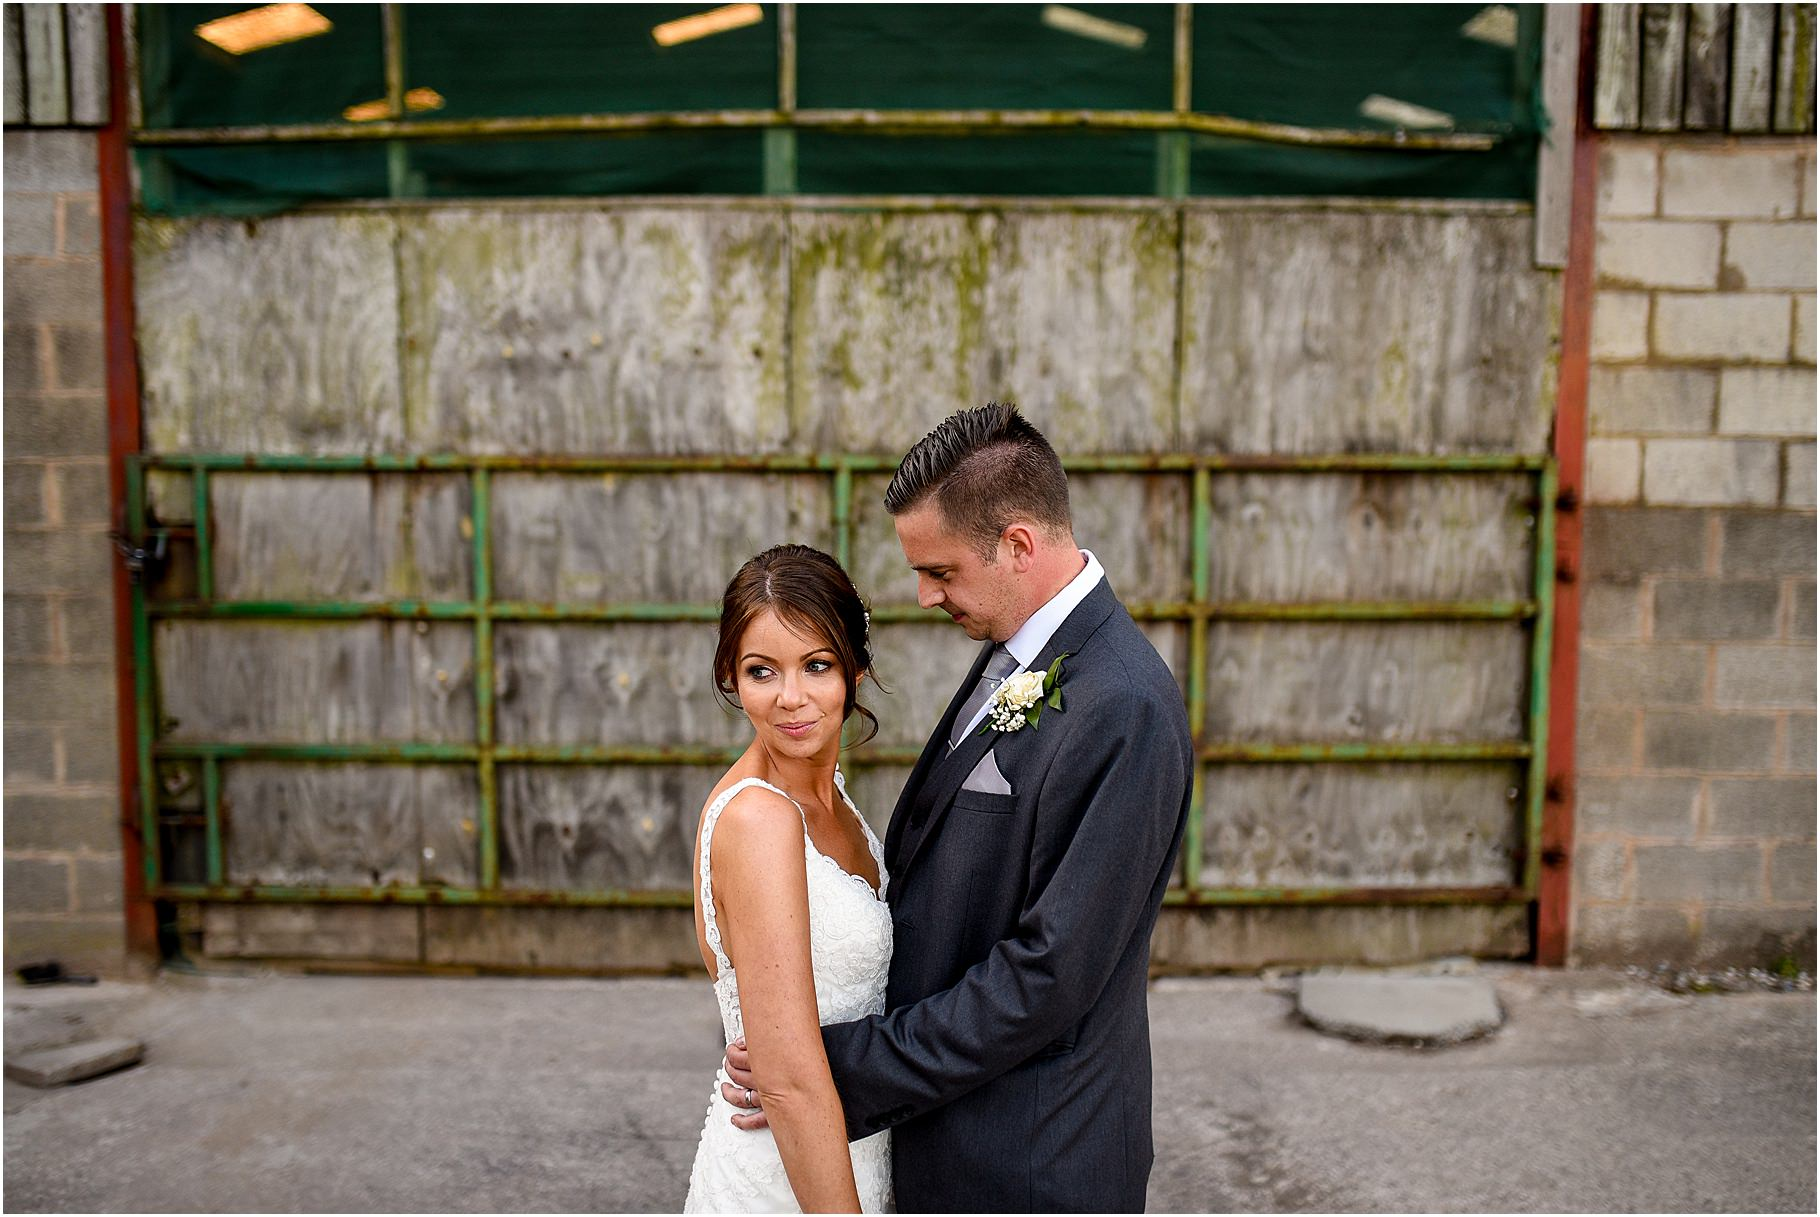 the-villa-wrea-green-wedding-photographer-65.jpg